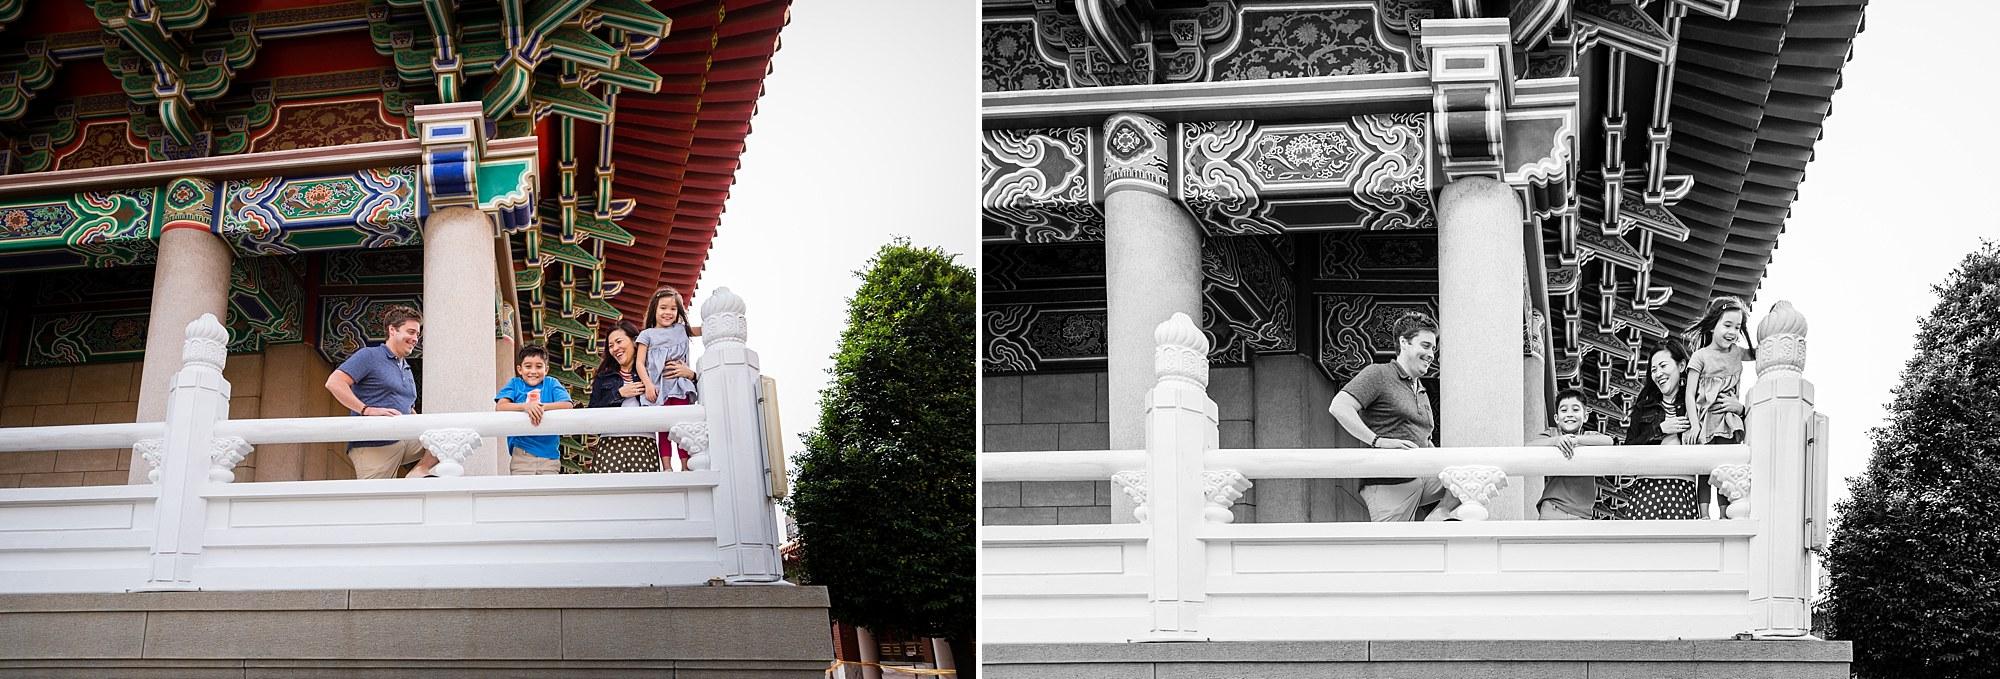 Taichung_Family_Photos_Hunnicutt_Photography_0033